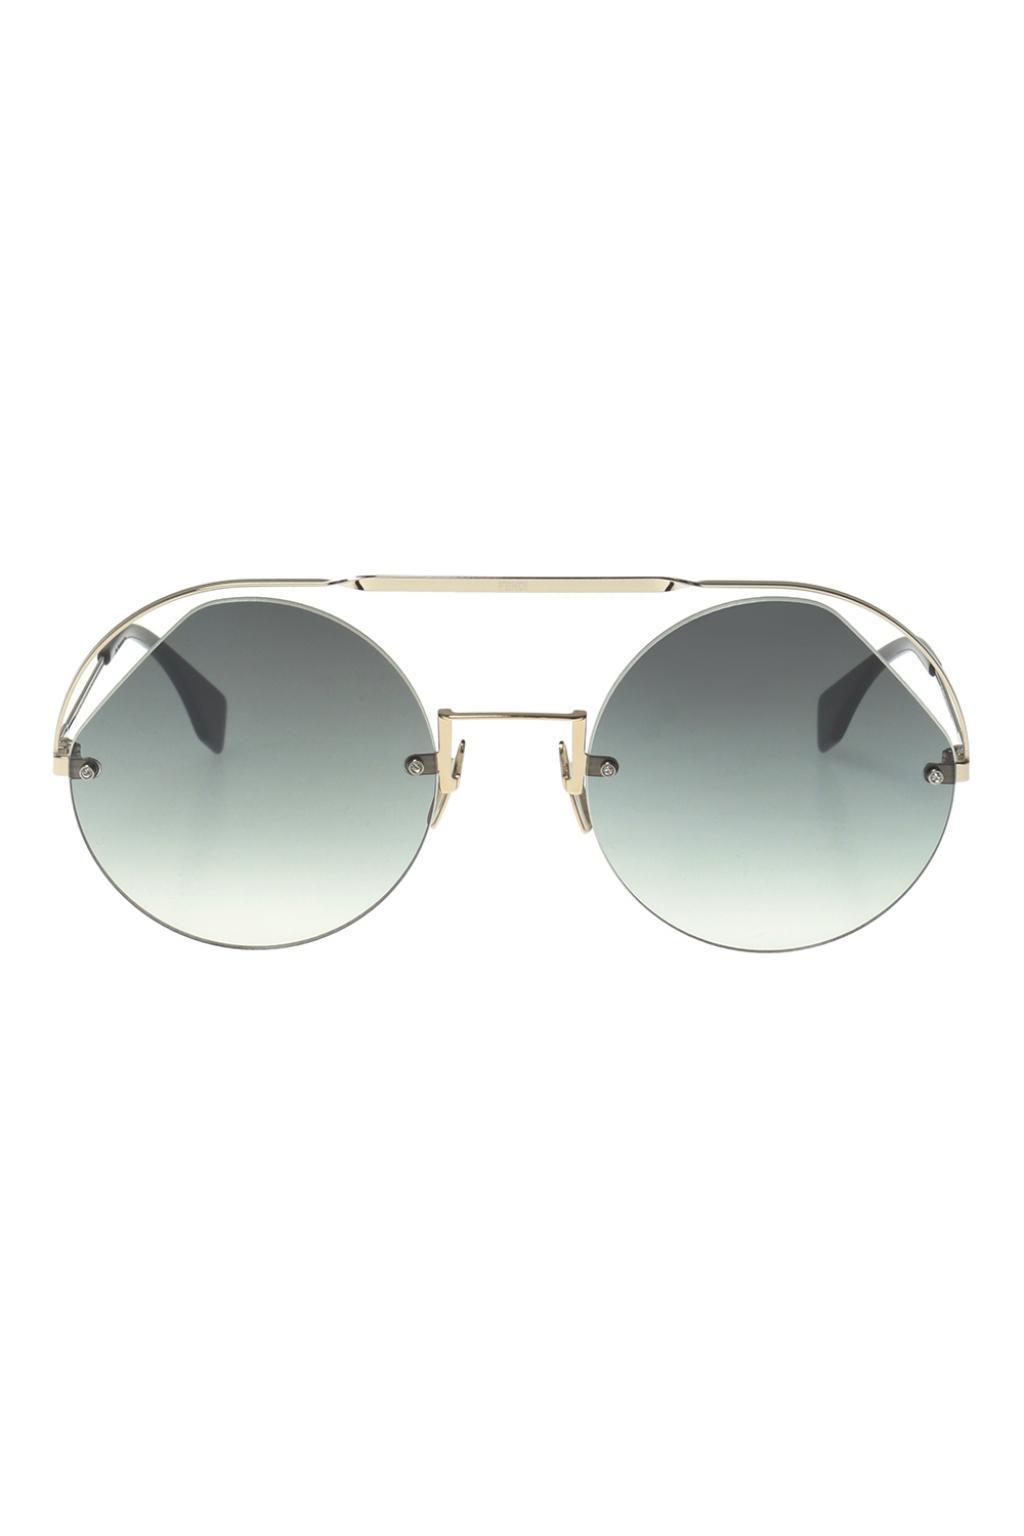 a3df45369ef Lyst - Fendi  ribbons   Crystals  Sunglasses in Metallic